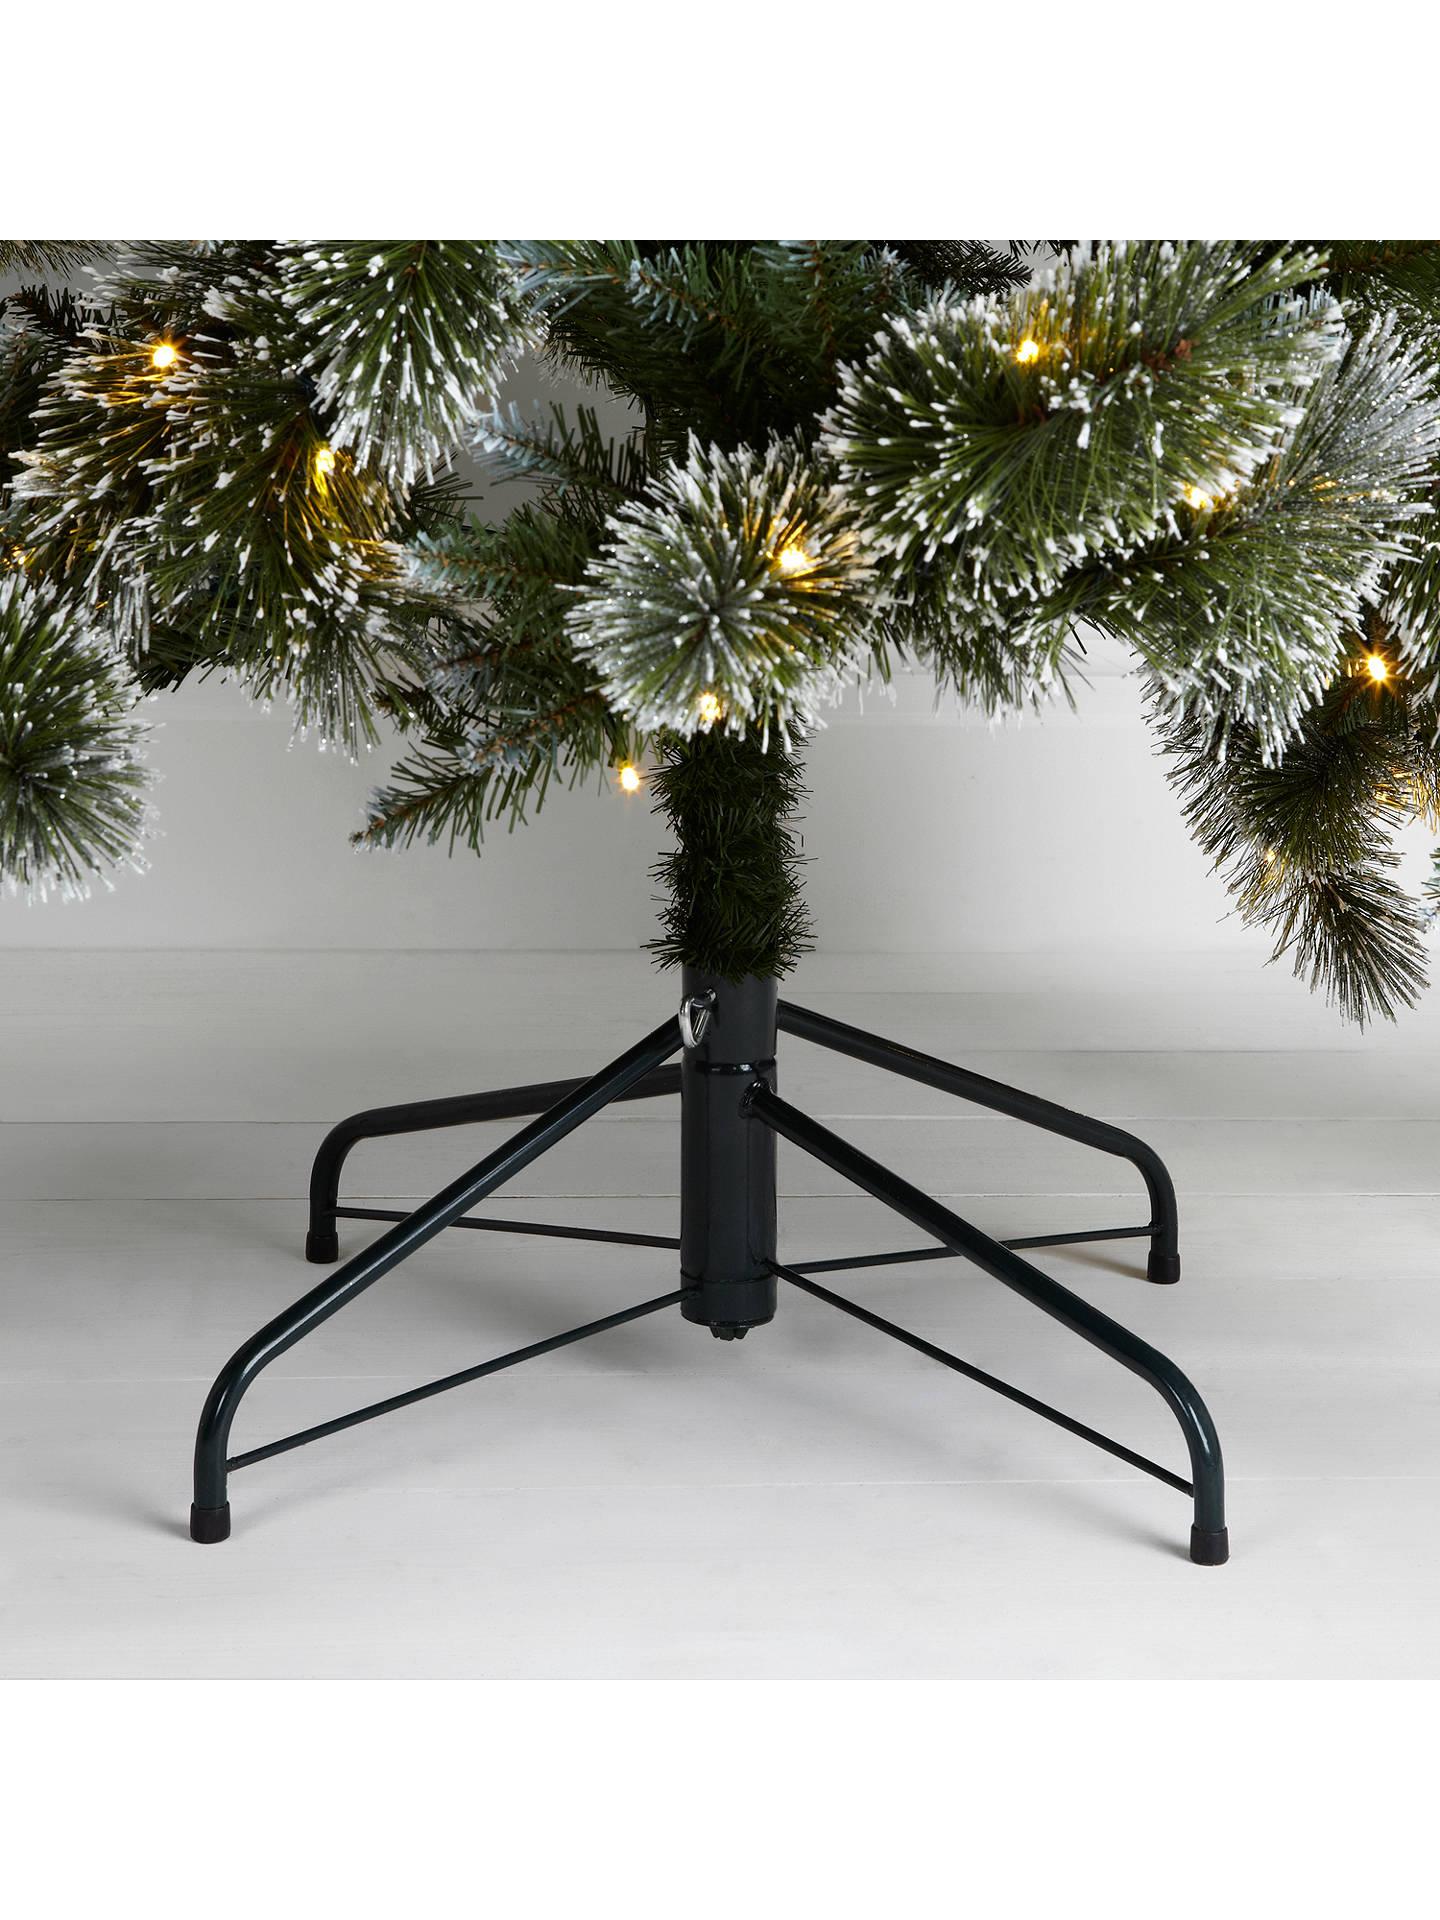 John Lewis Pre-lit LED Glitter Tip Christmas Tree, Green, 7ft at John Lewis & Partners